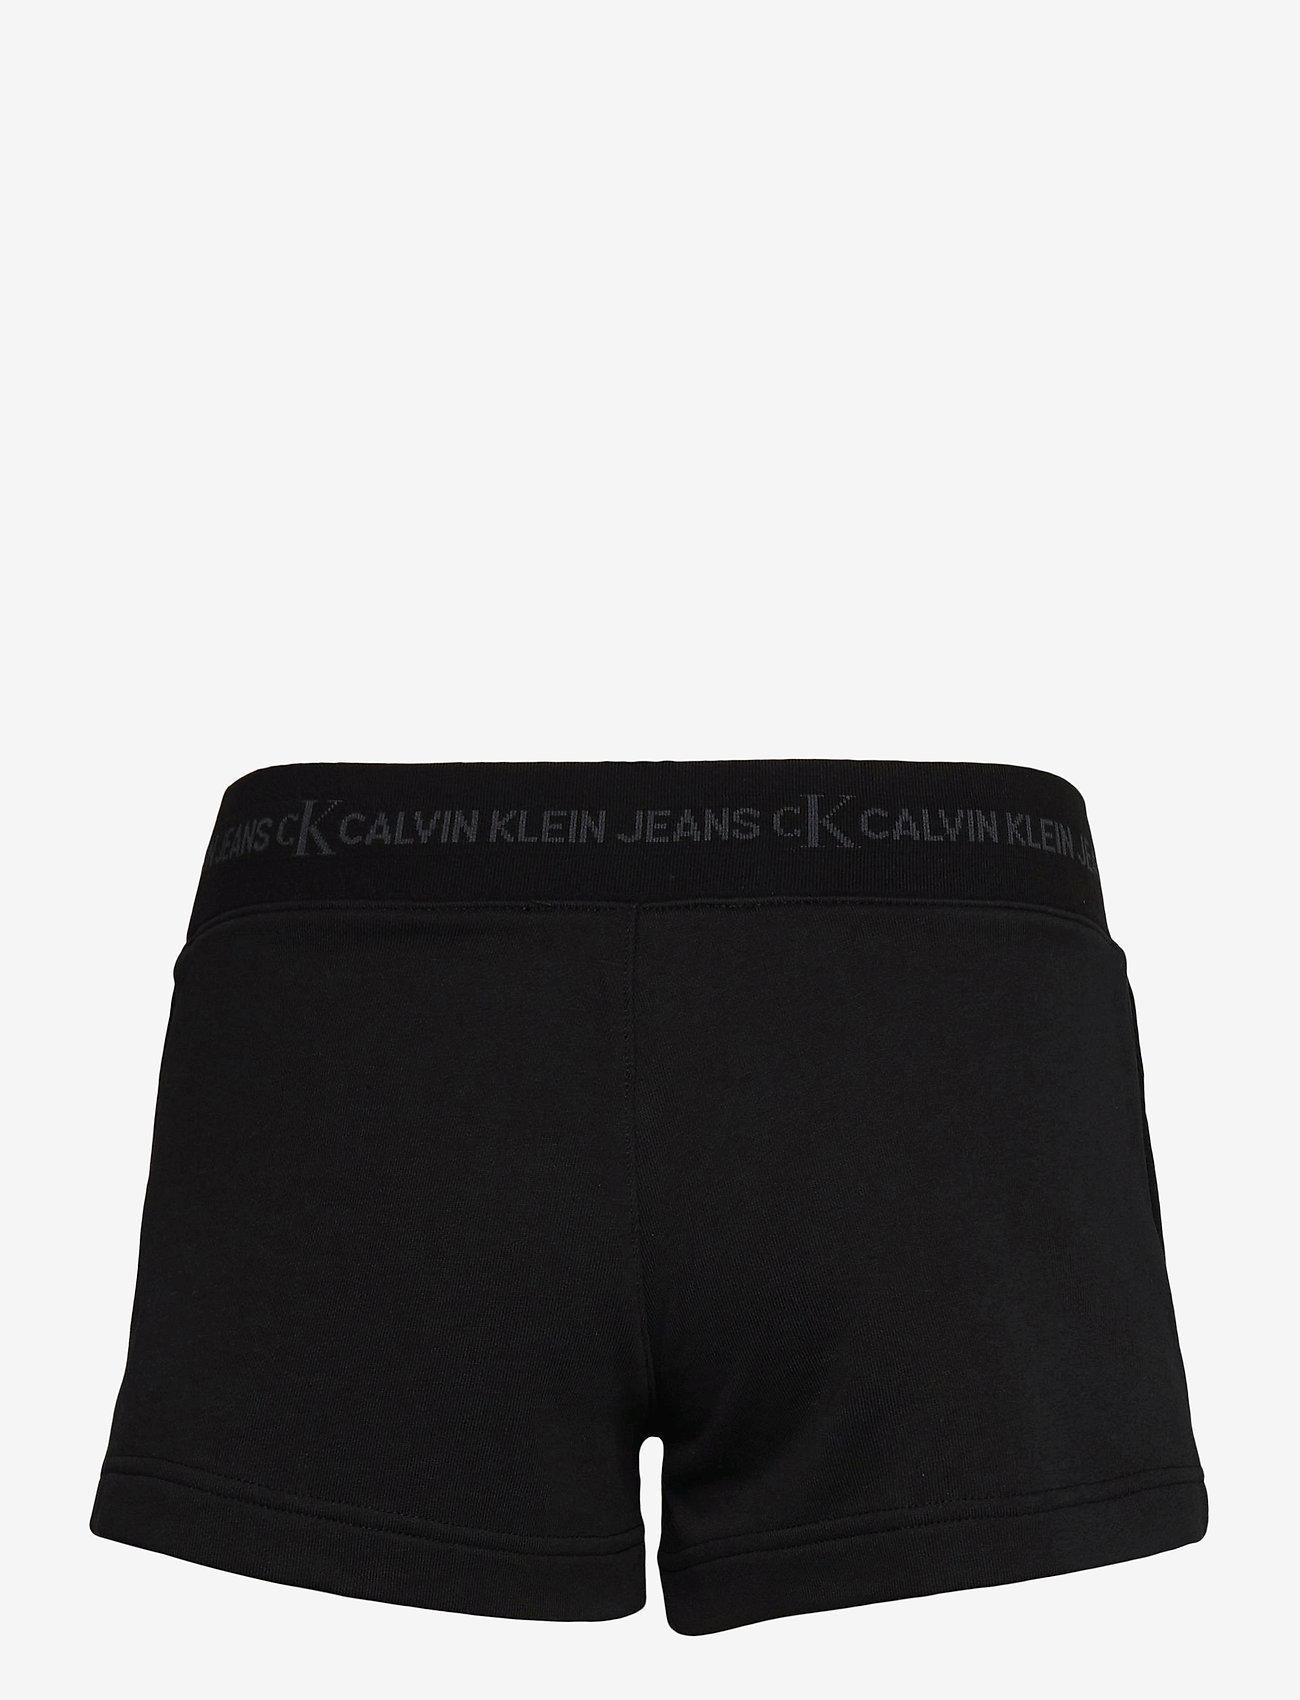 Calvin Klein Jeans - LOGO TRIM KNIT SHORT - shorts casual - ck black - 1